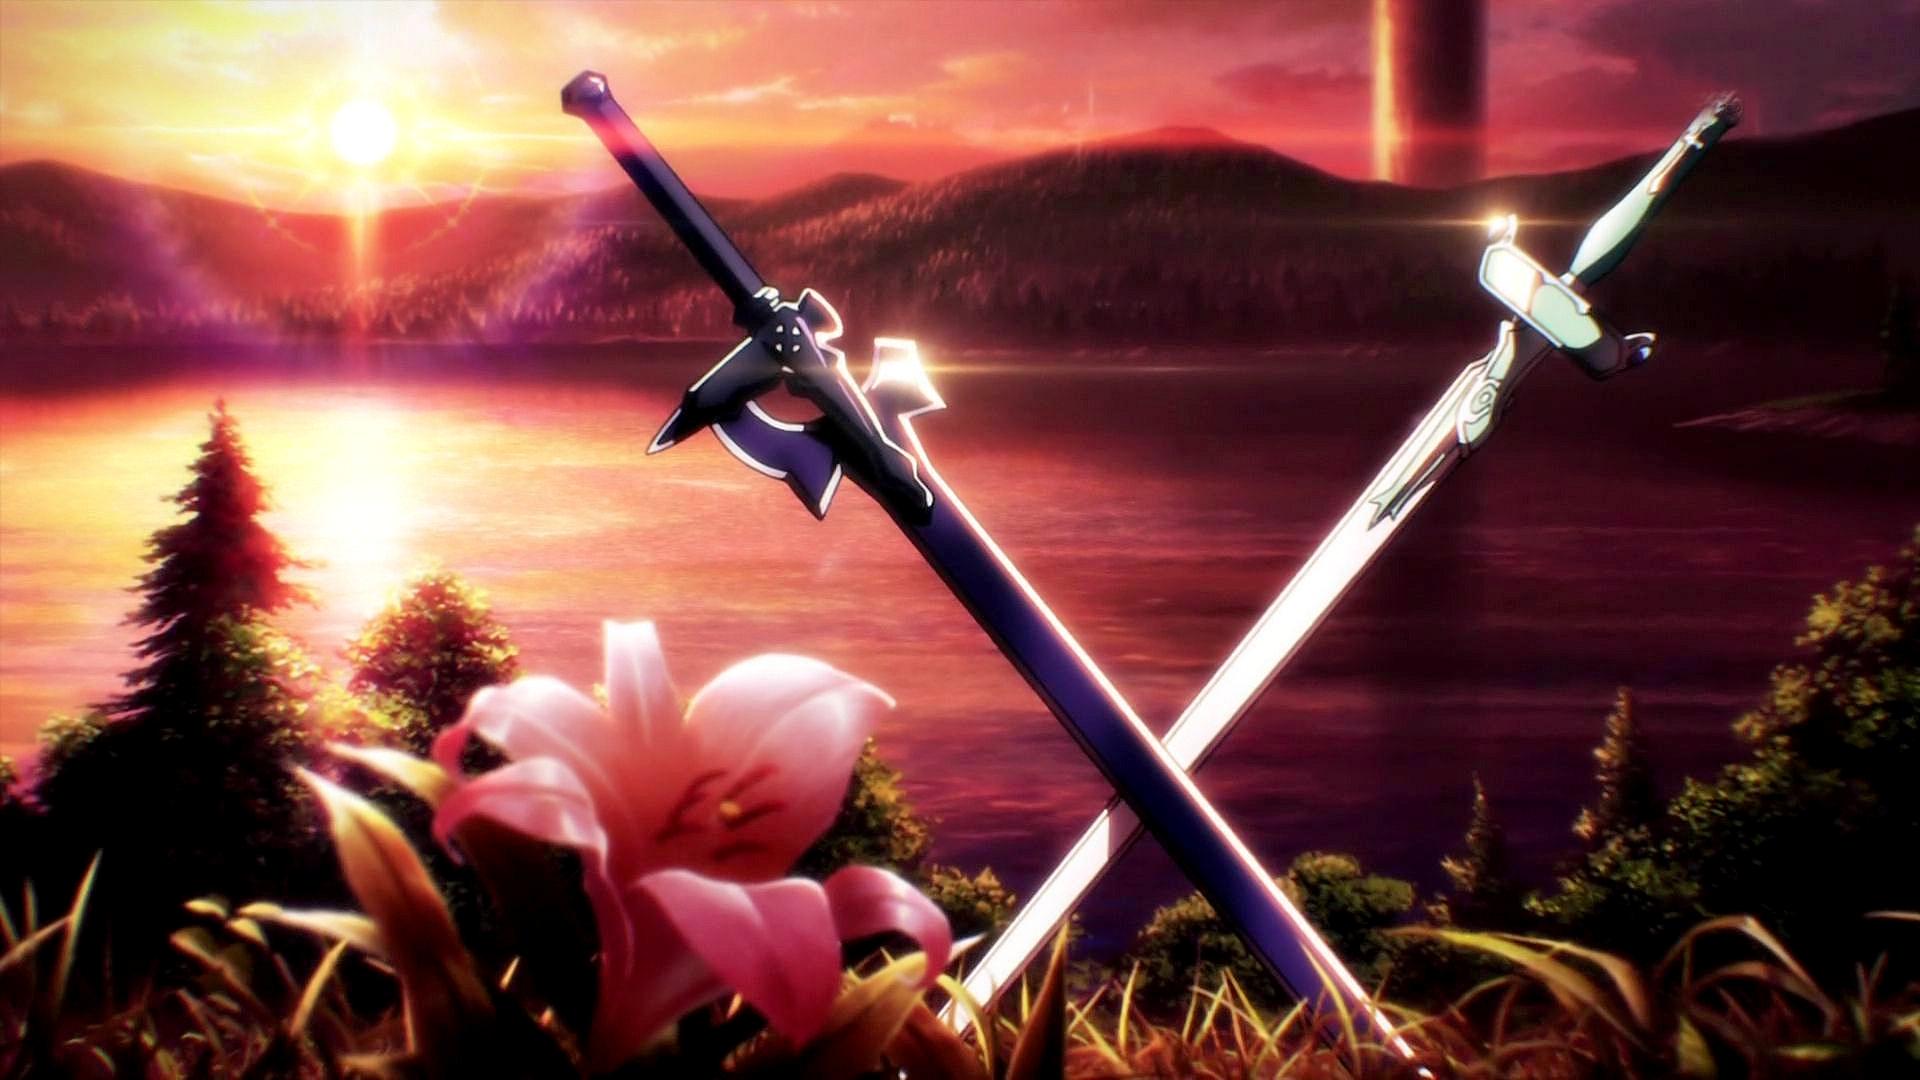 1080p Anime Wallpaper Hd Sword art online anime hd 3d 1920x1080